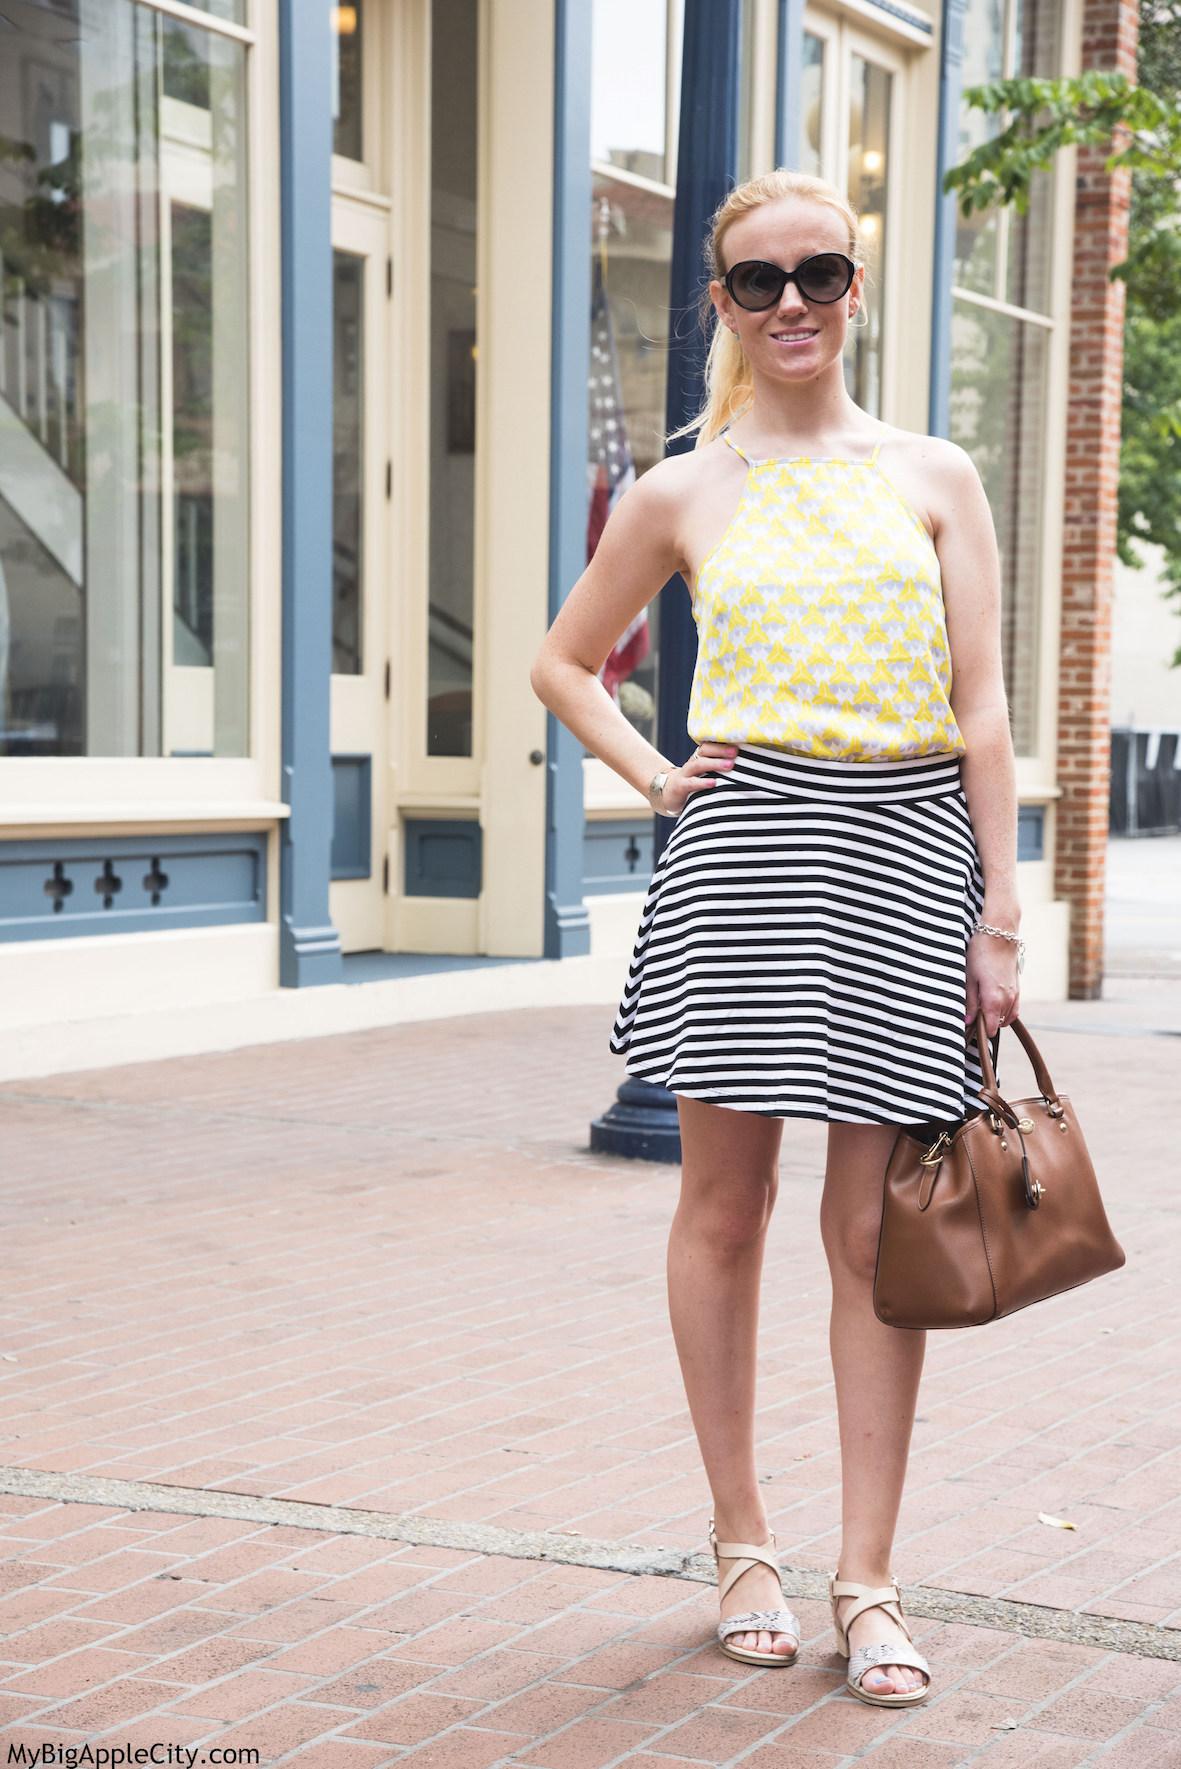 Fashion-blogger-ootd-hm-outfit-french-mybigapplecity